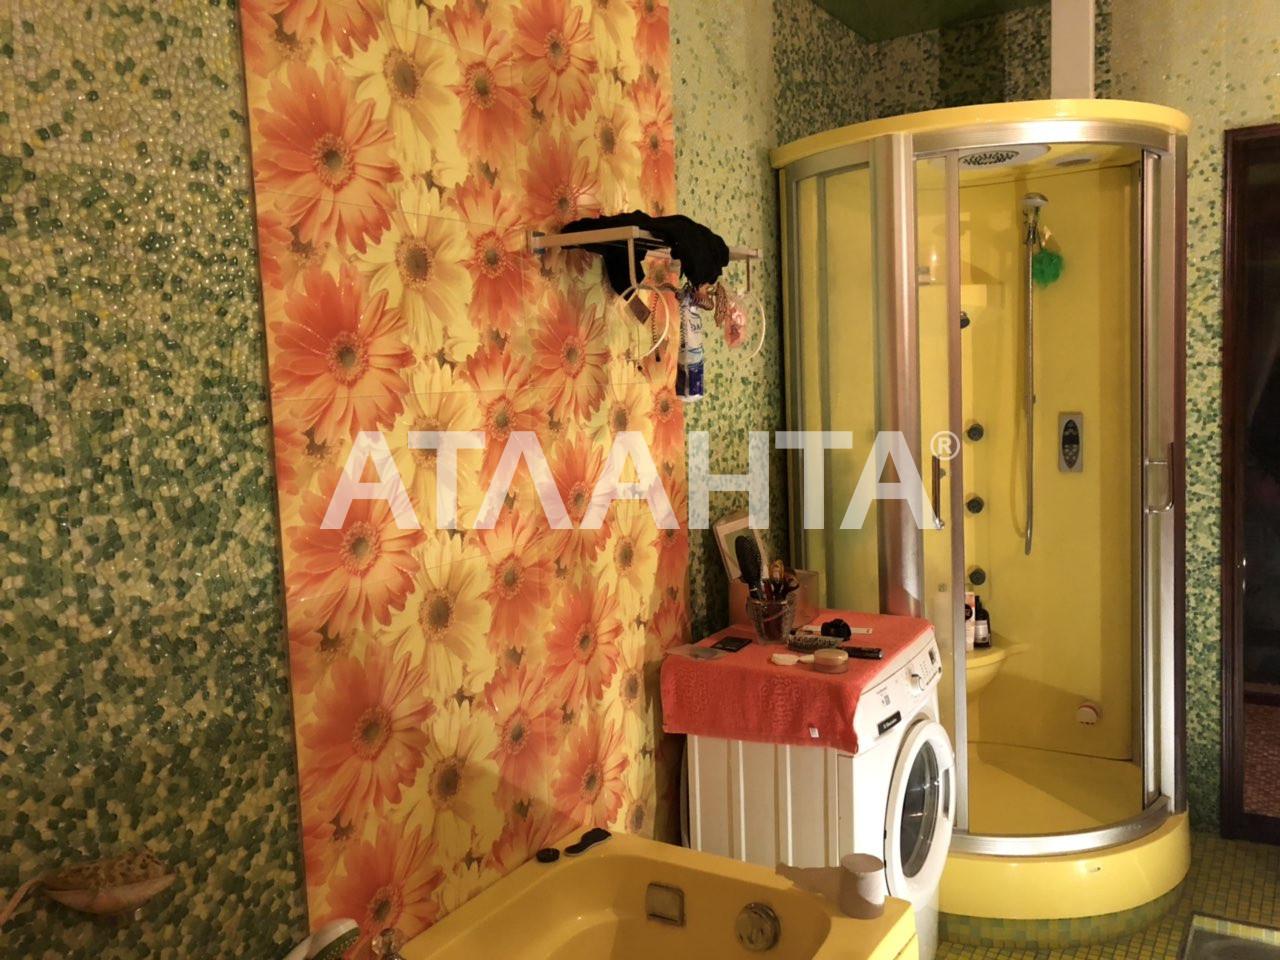 Продается 3-комнатная Квартира на ул. 1 Мая — 135 000 у.е. (фото №14)